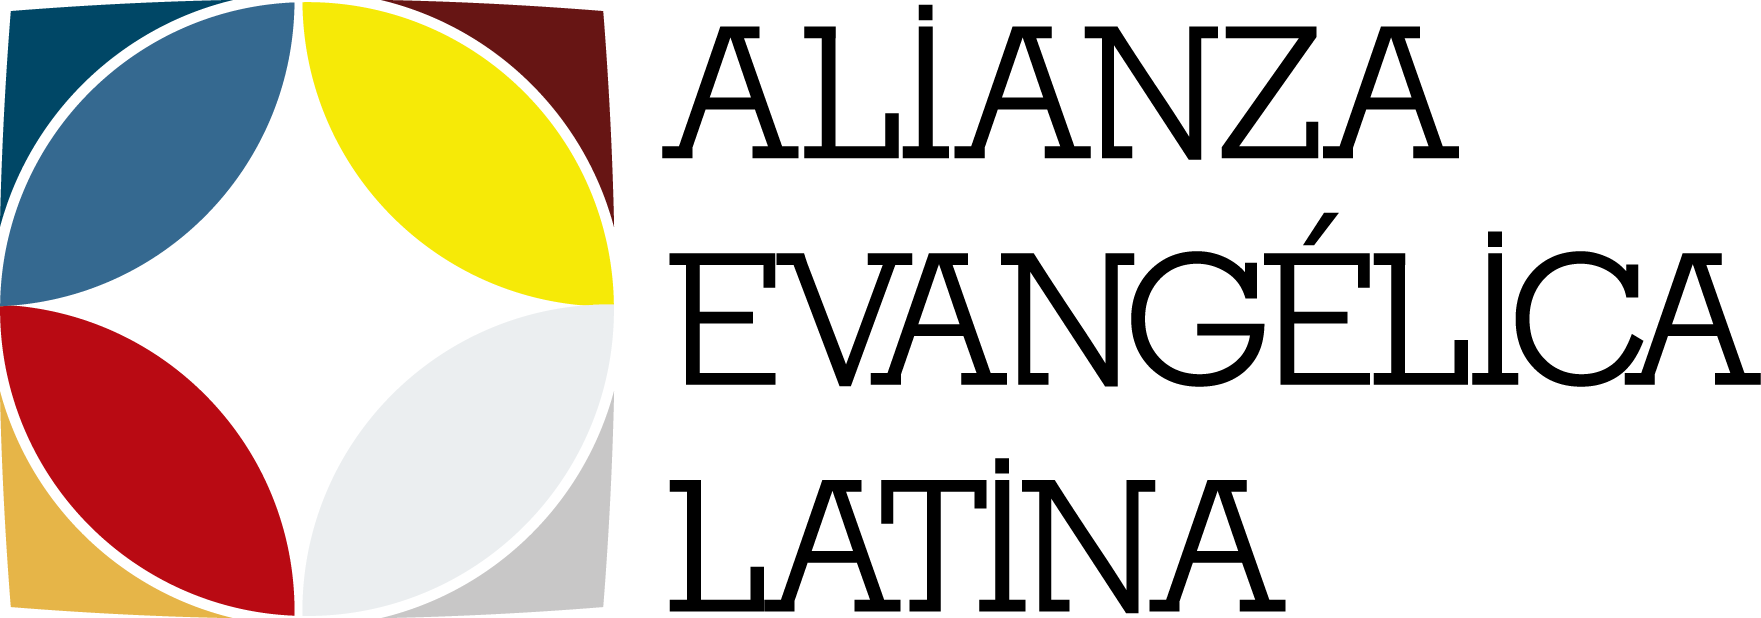 Alianza Evangélica Latina